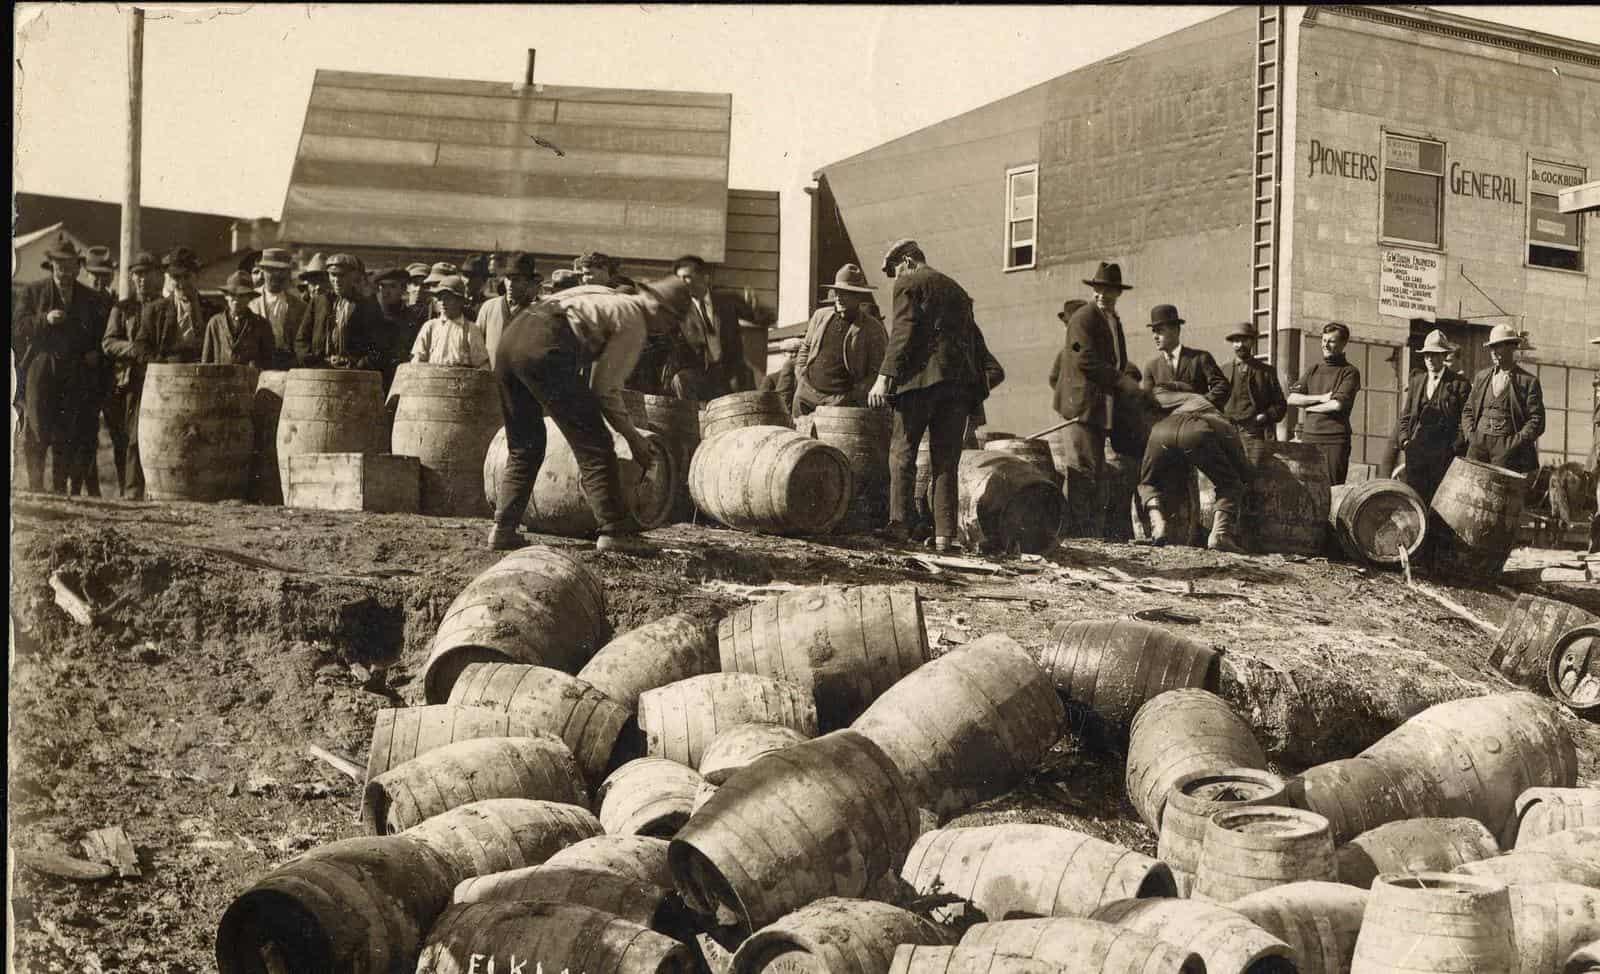 Police raid during prohibition Main